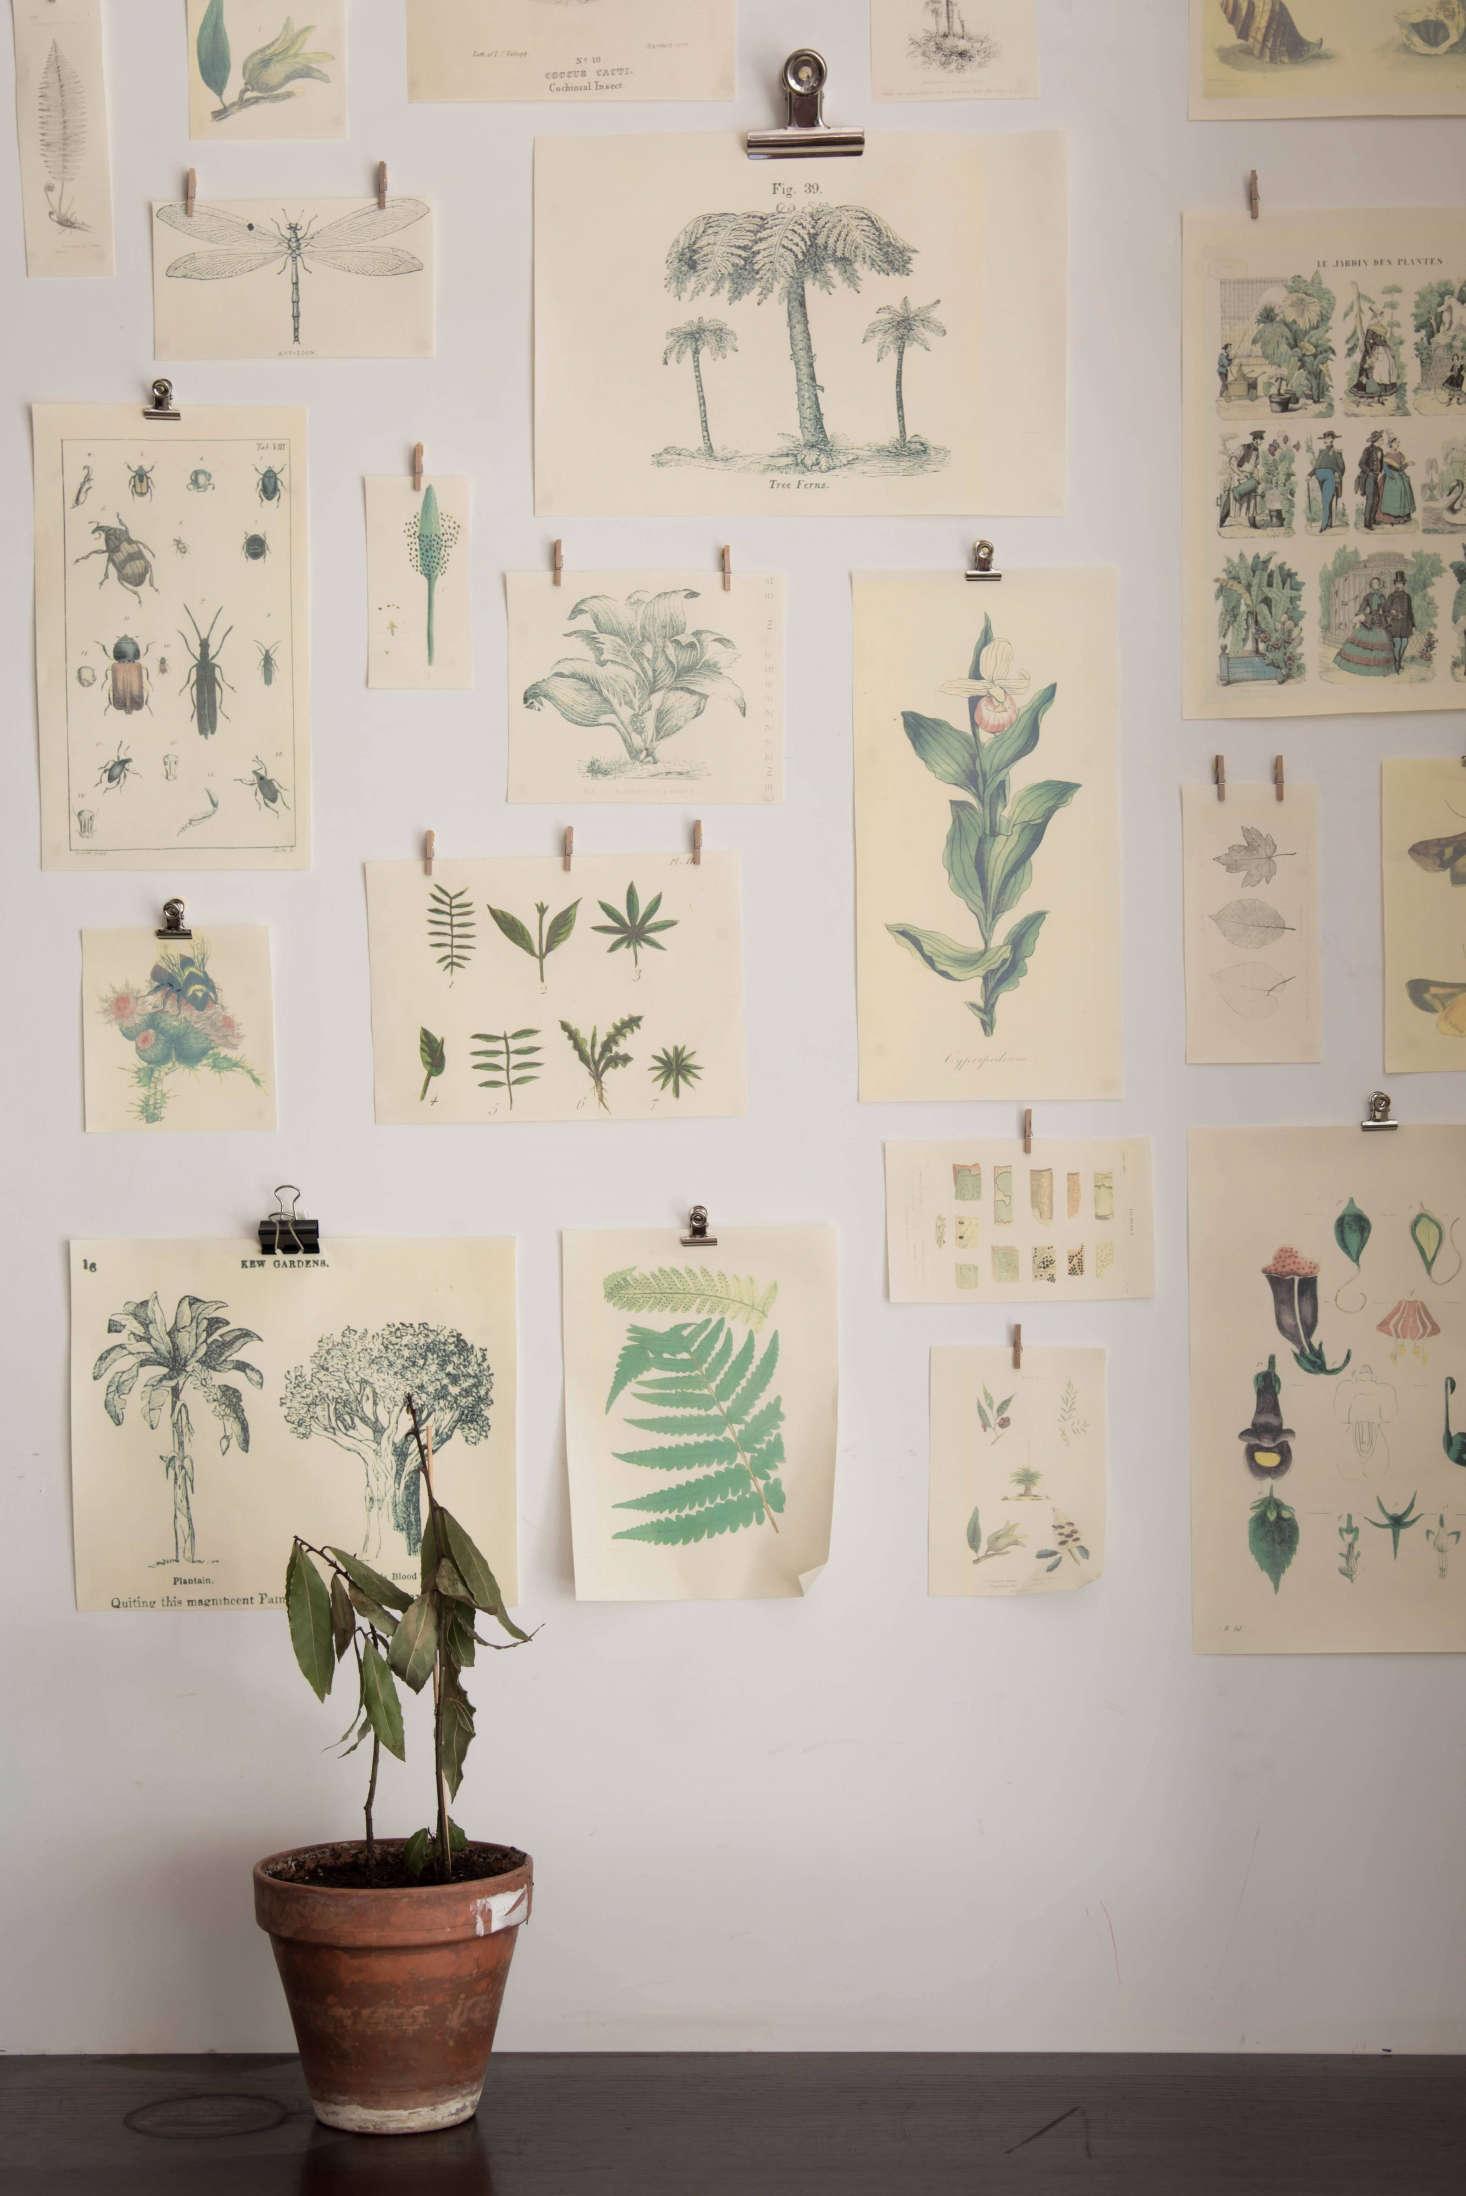 Pin It: At GreenHouse: A Natural Wine Bar In Paris, Found Botanical Drawings